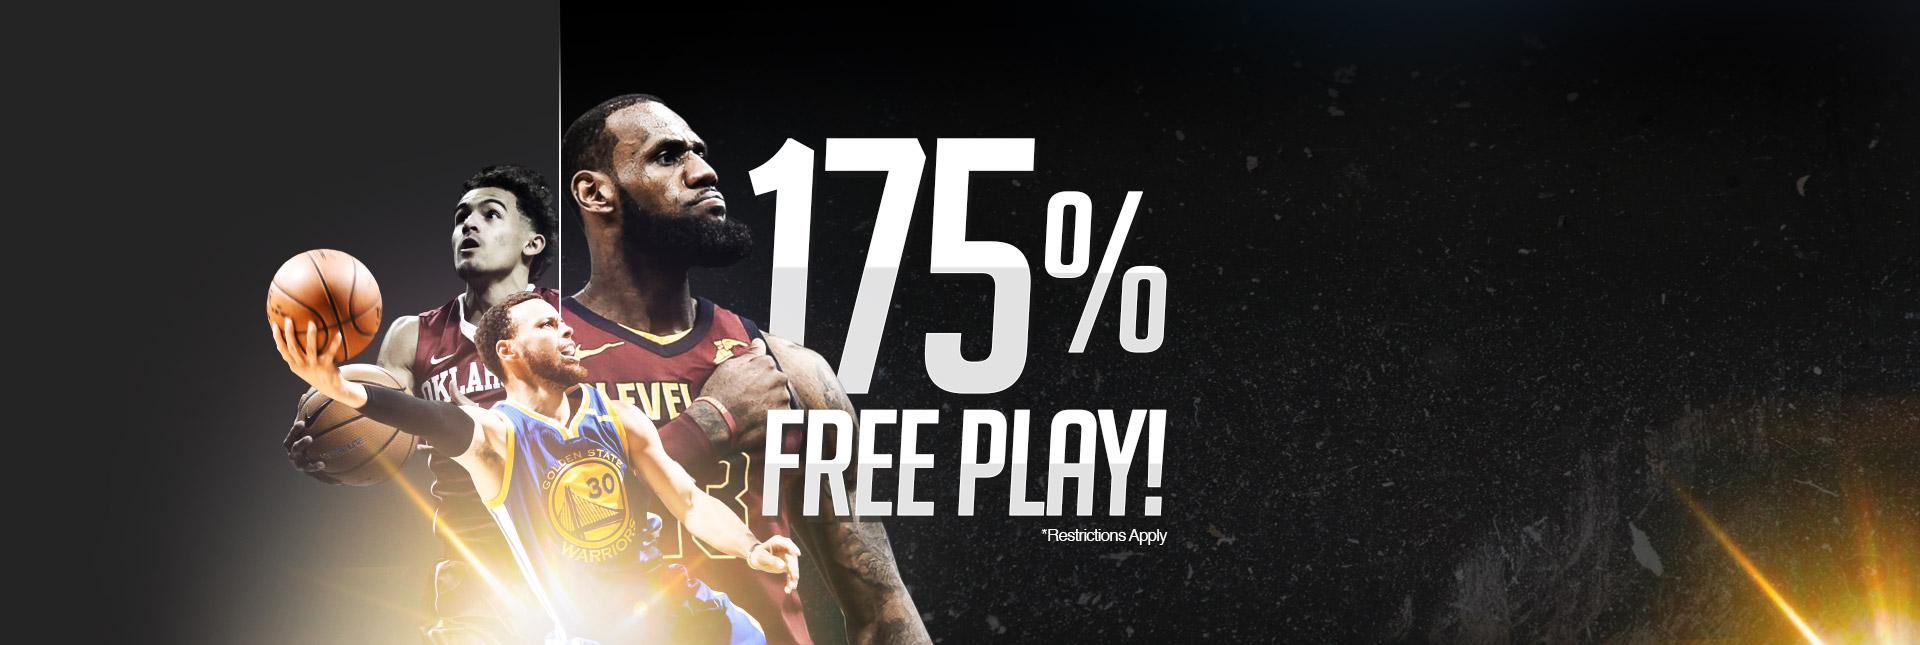 175% Free Play!